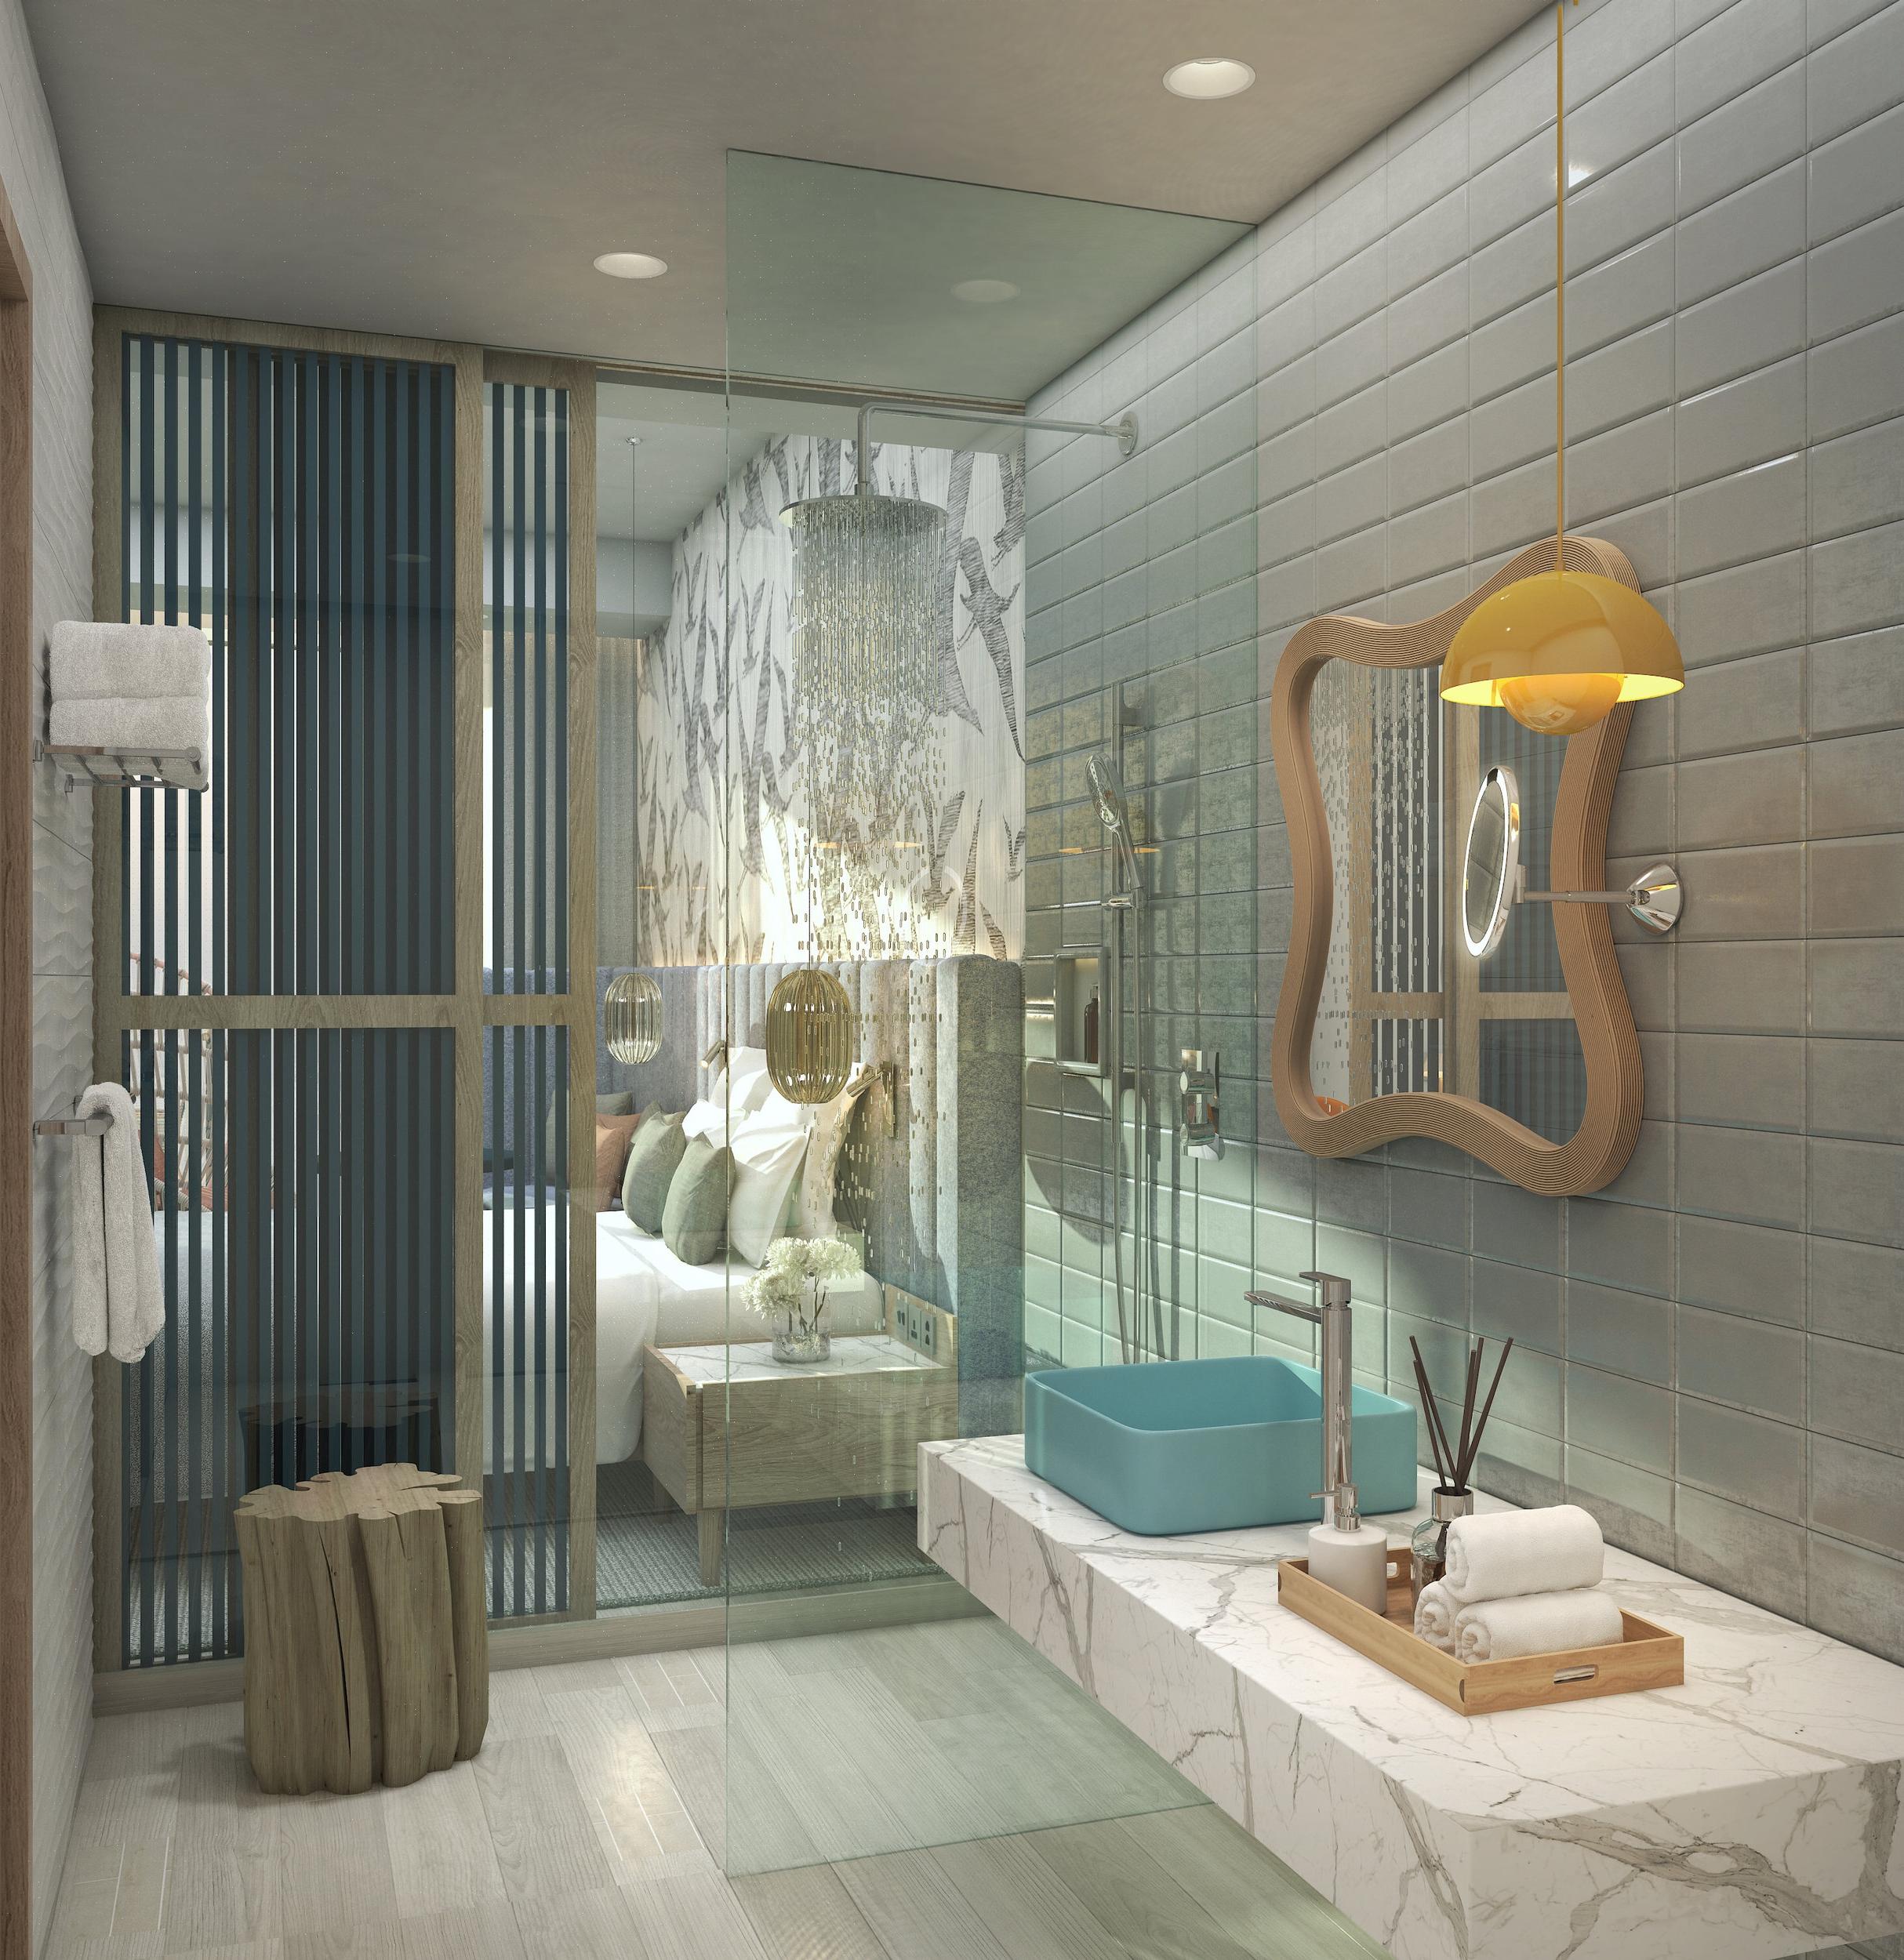 Bathroom - Blue Timber and light headboard.jpg